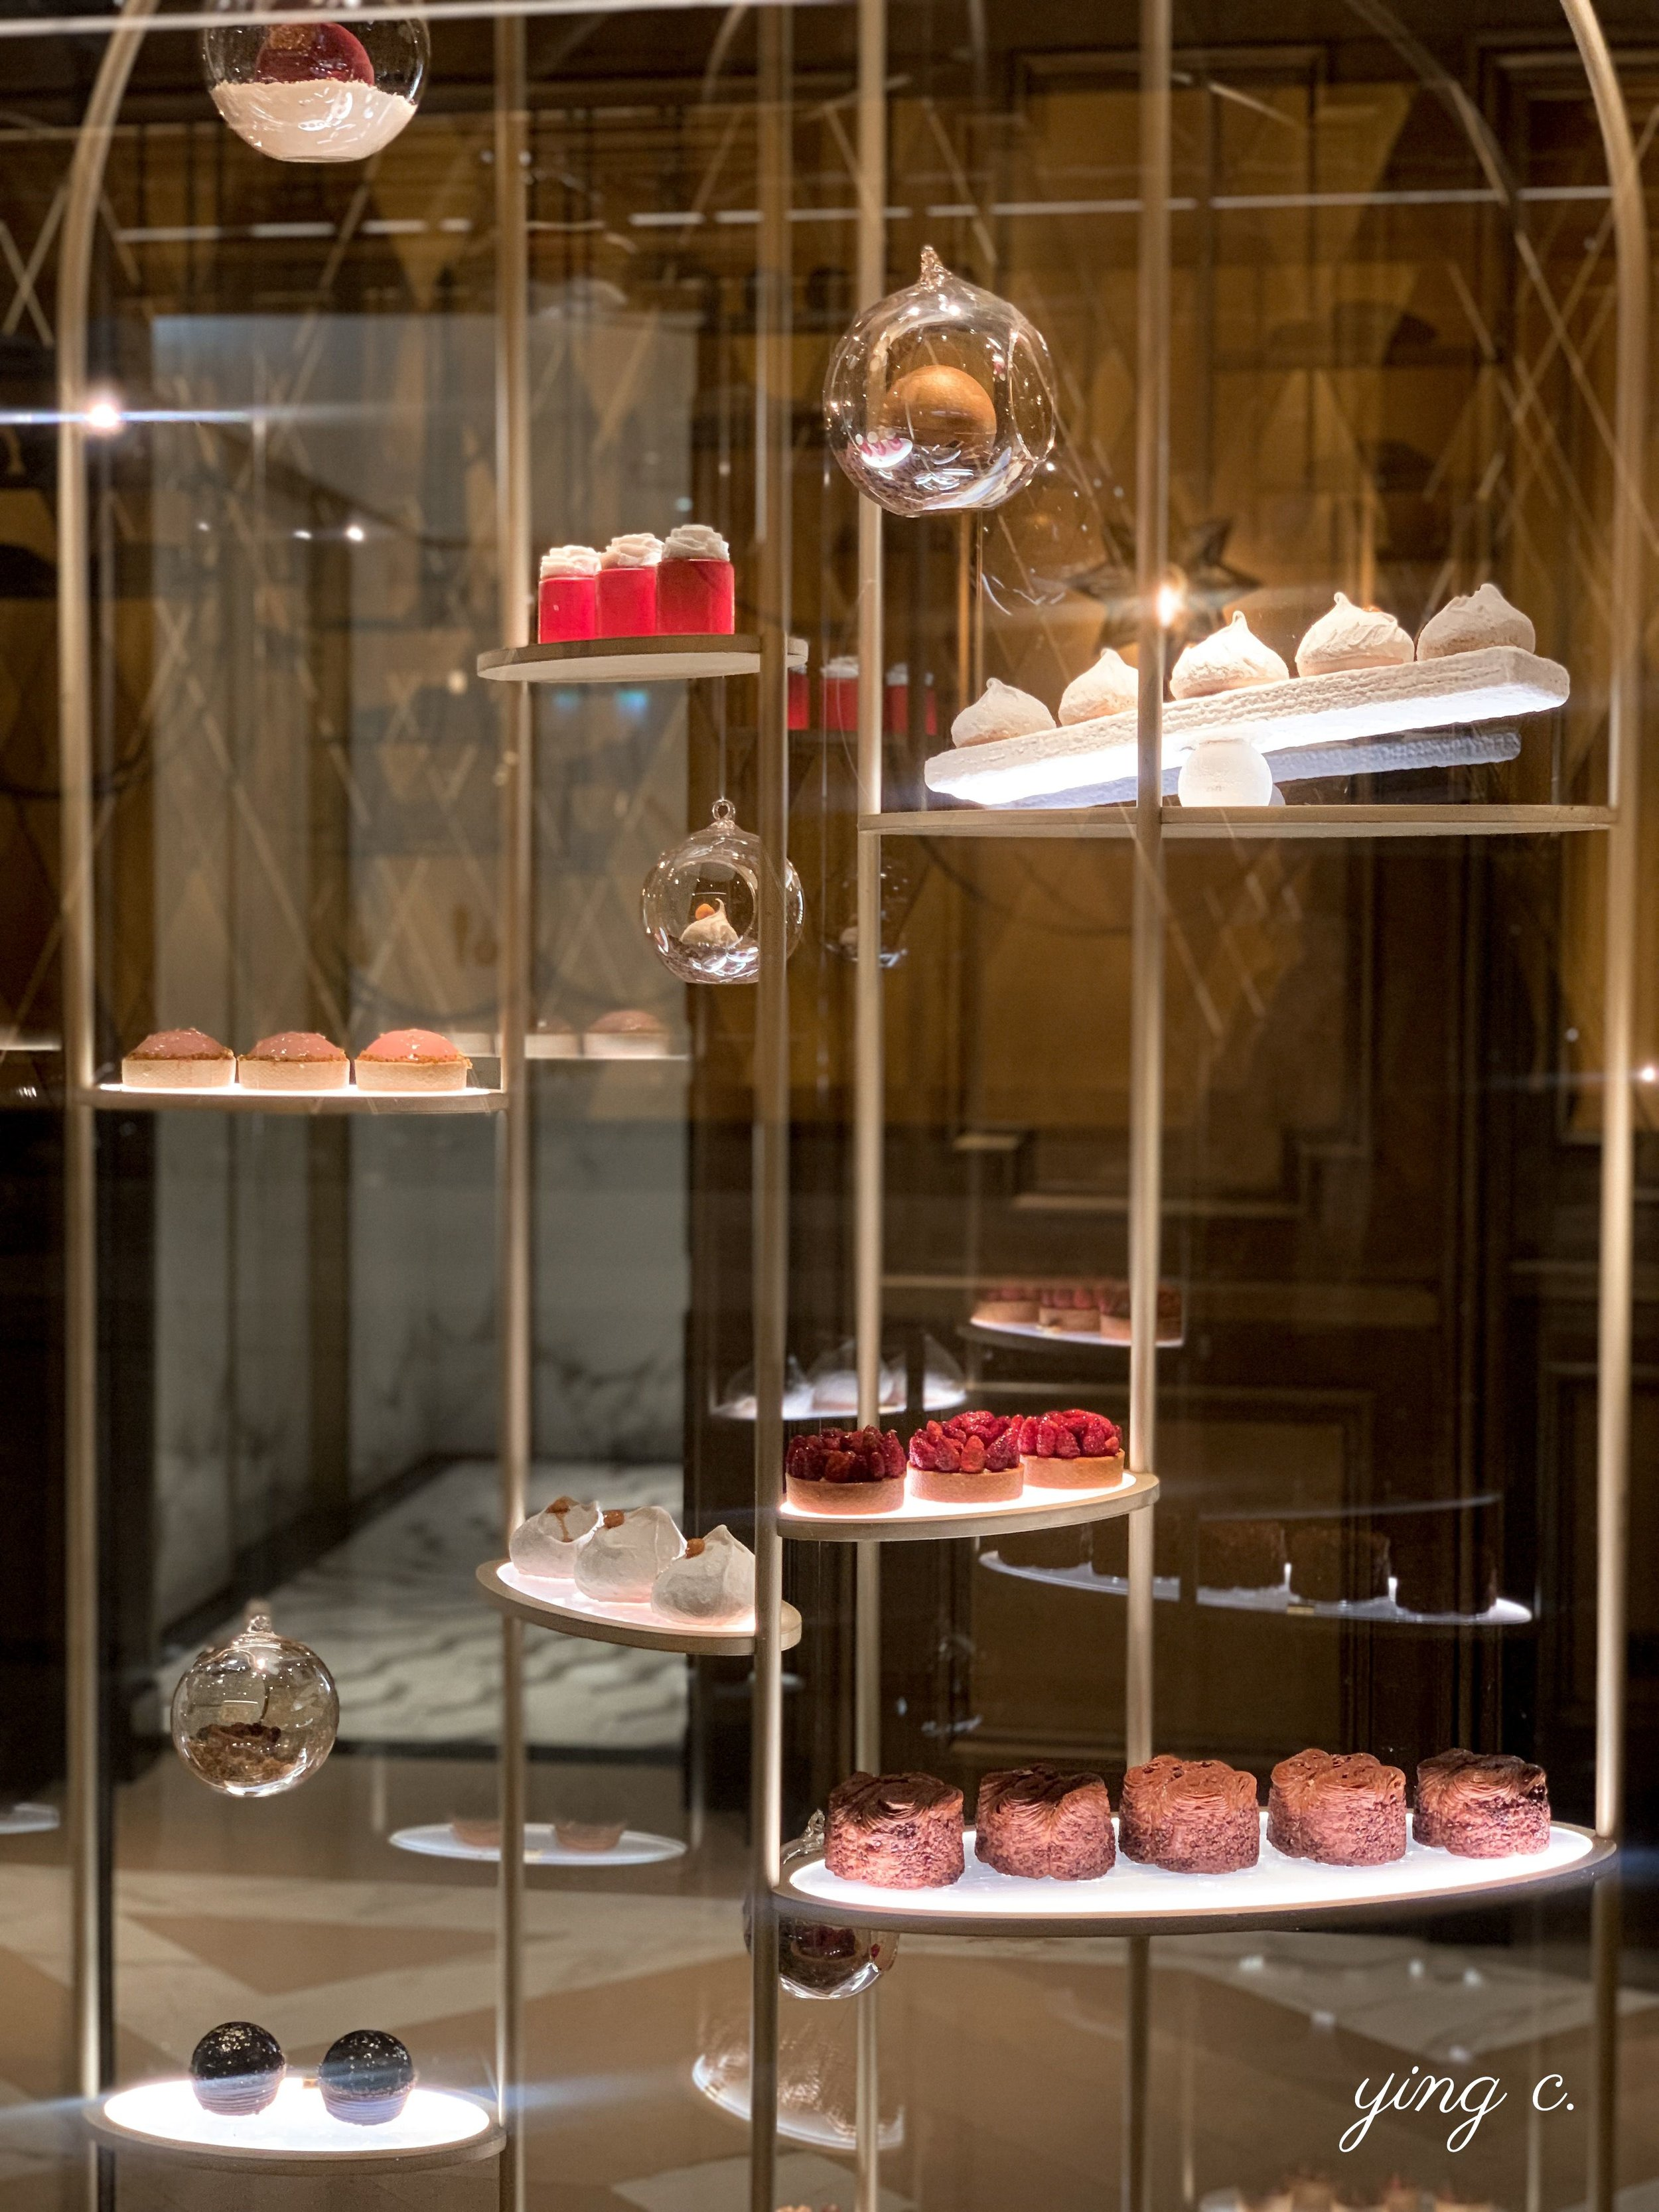 Crillon 酒店內 Le Boudoir 甜點店的櫥窗,擺滿了 Pablo Gicquel 主廚的創作。每個甜點都閃閃發光,讓人宛如身處高級珠寶店。